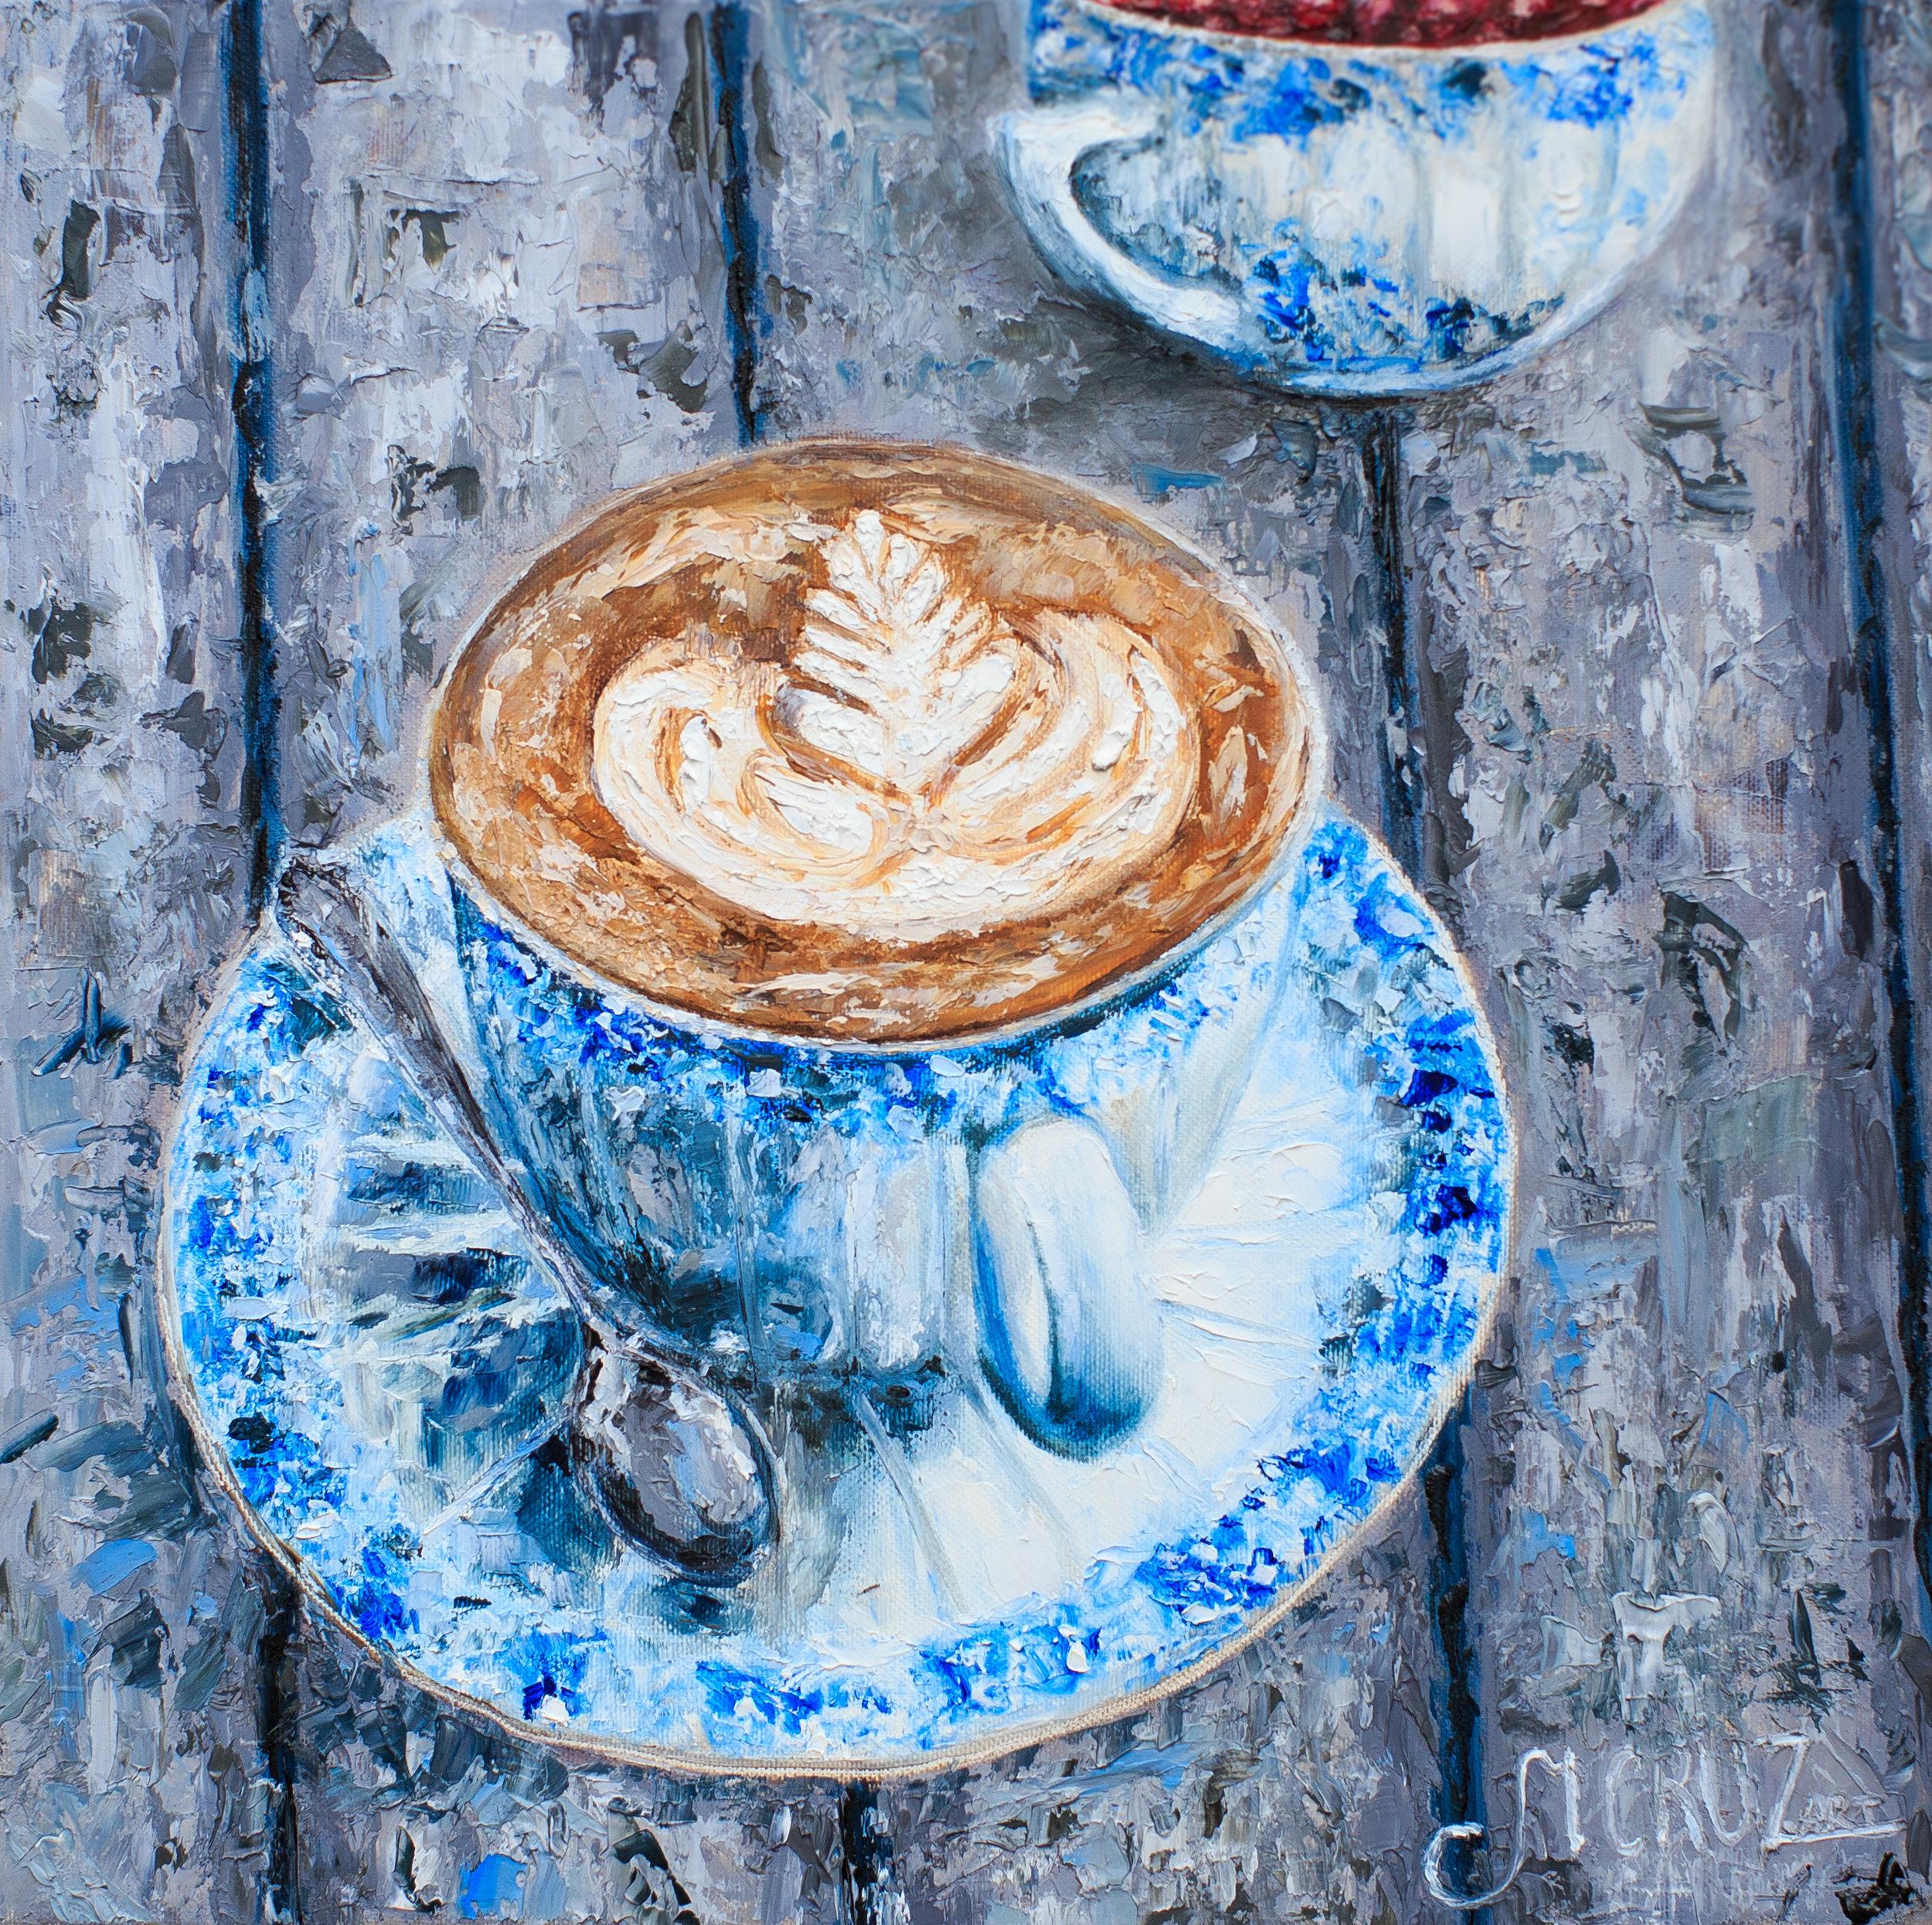 2017-10-30-MargaritaCruz-Art-Blue-white-Delft-latte-cappuccino-16.jpg